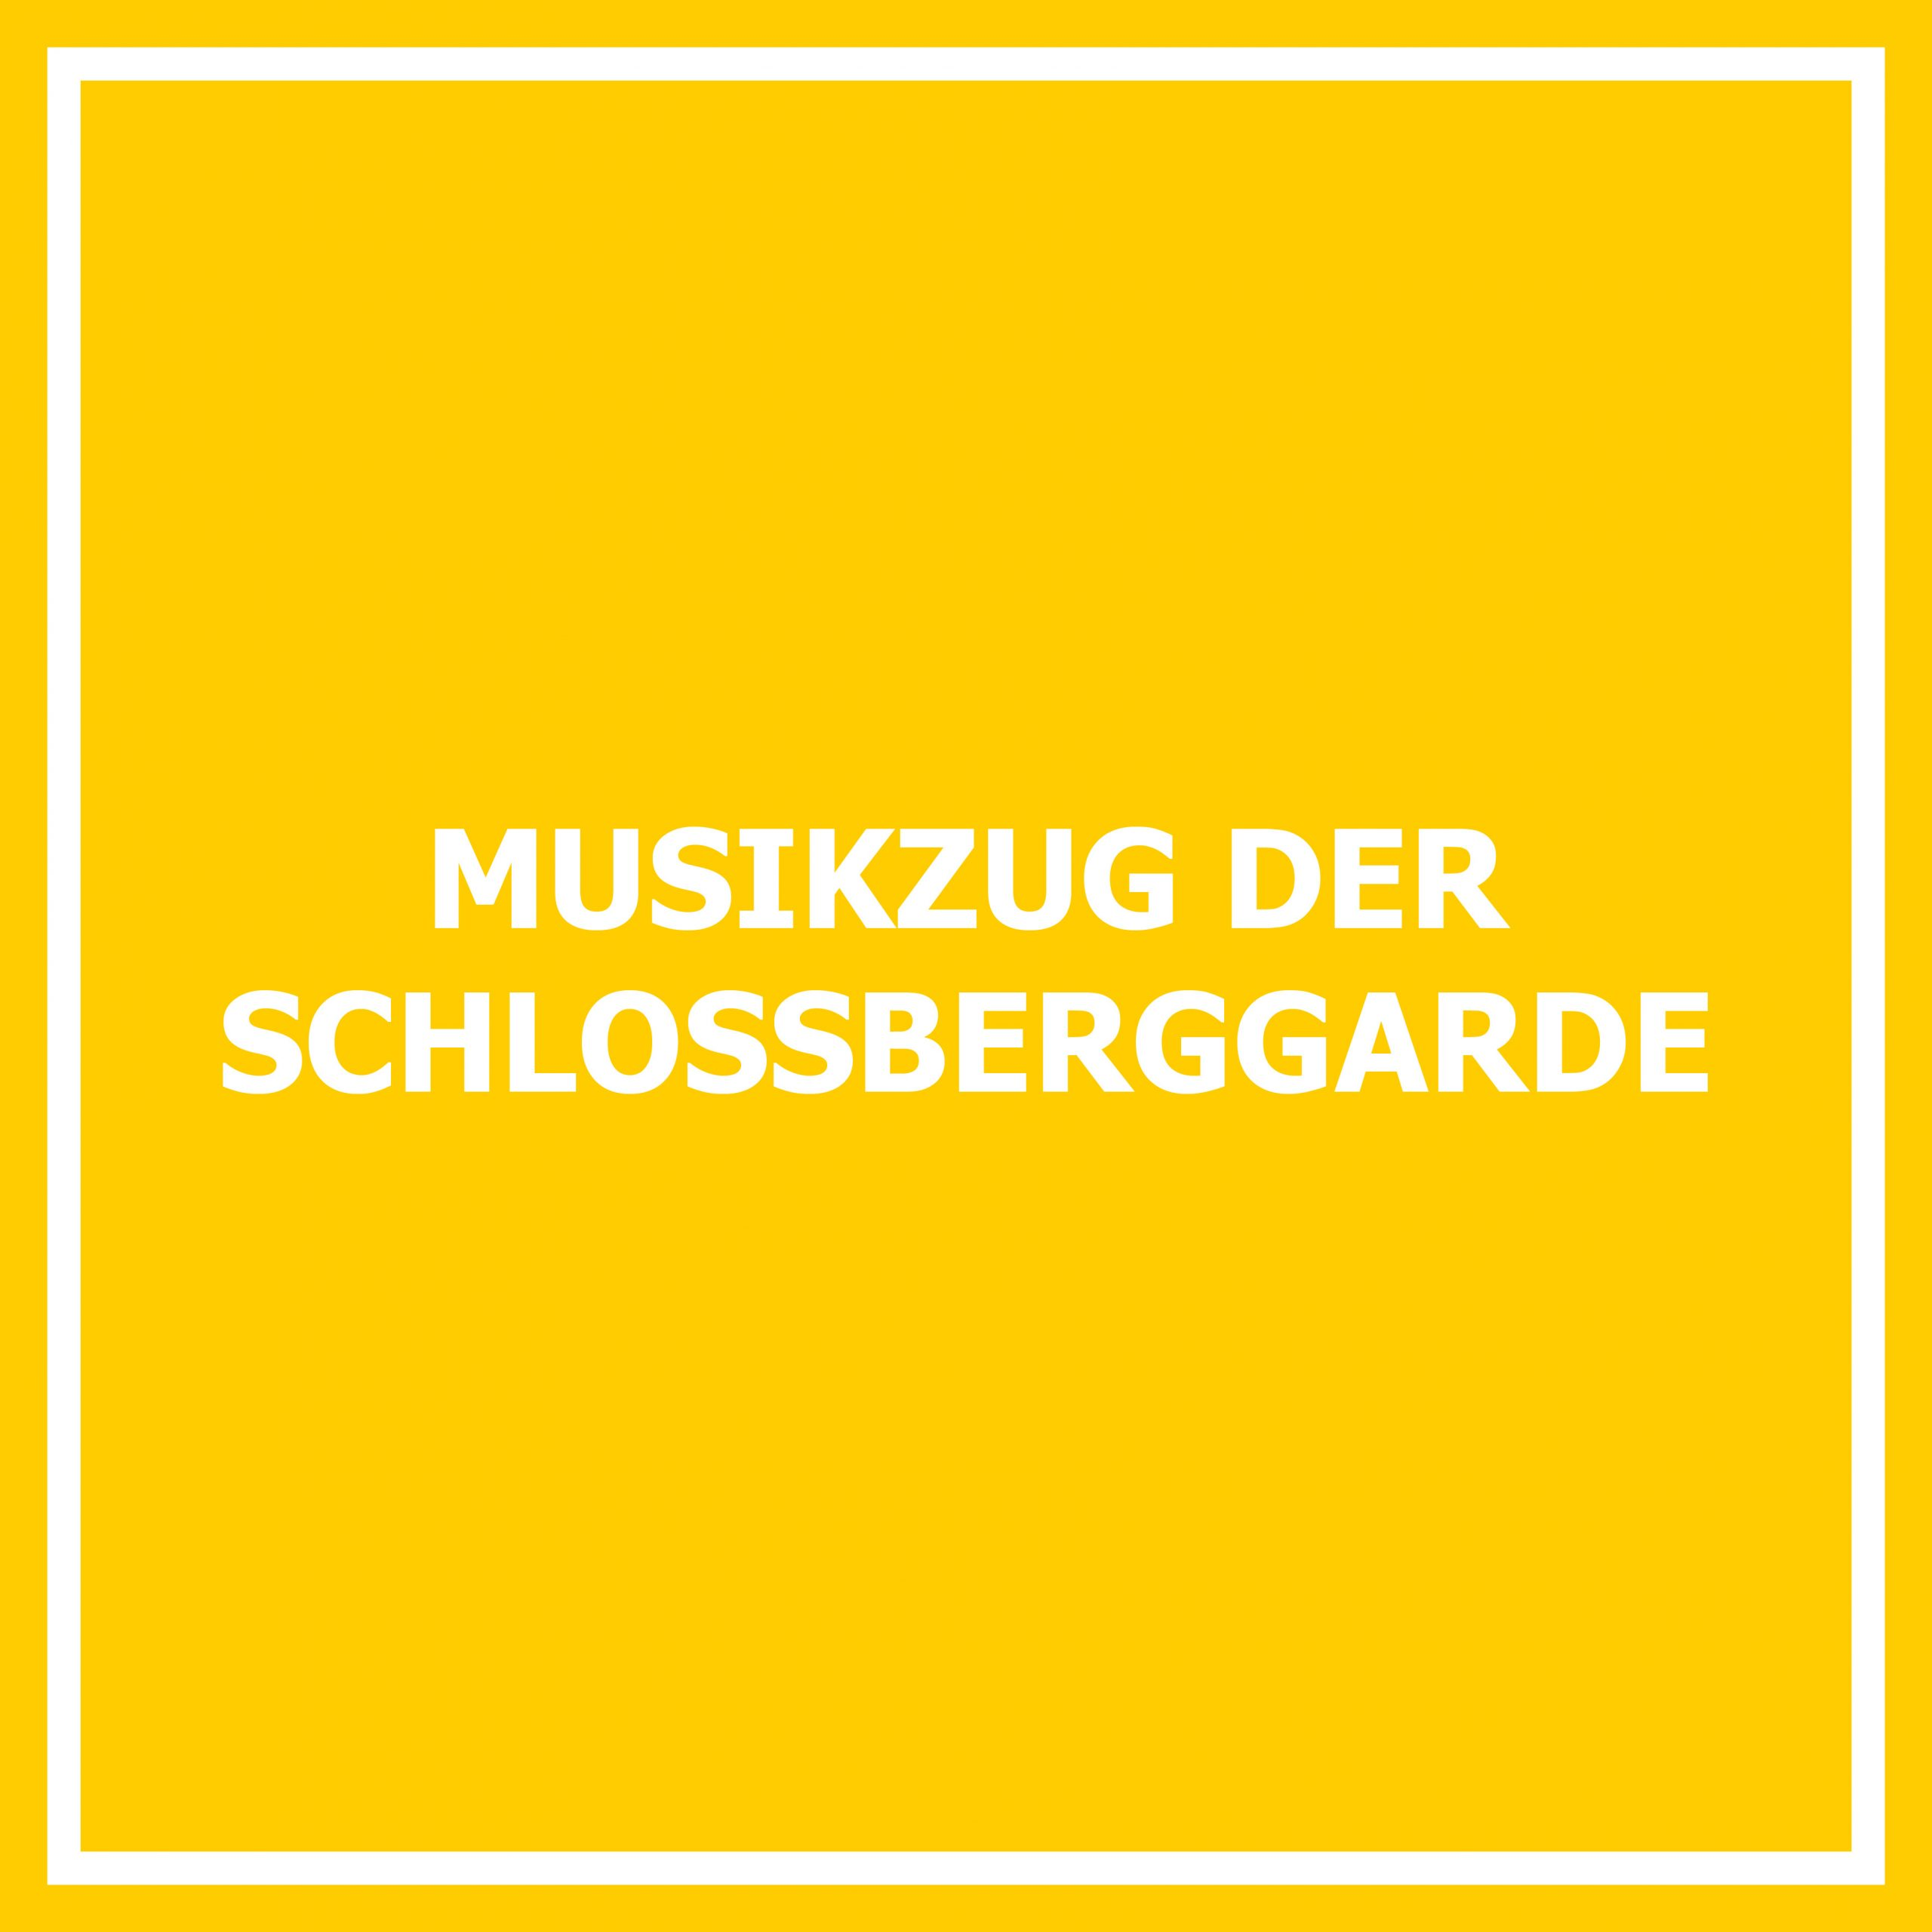 Musikzug der Schloßberggarde